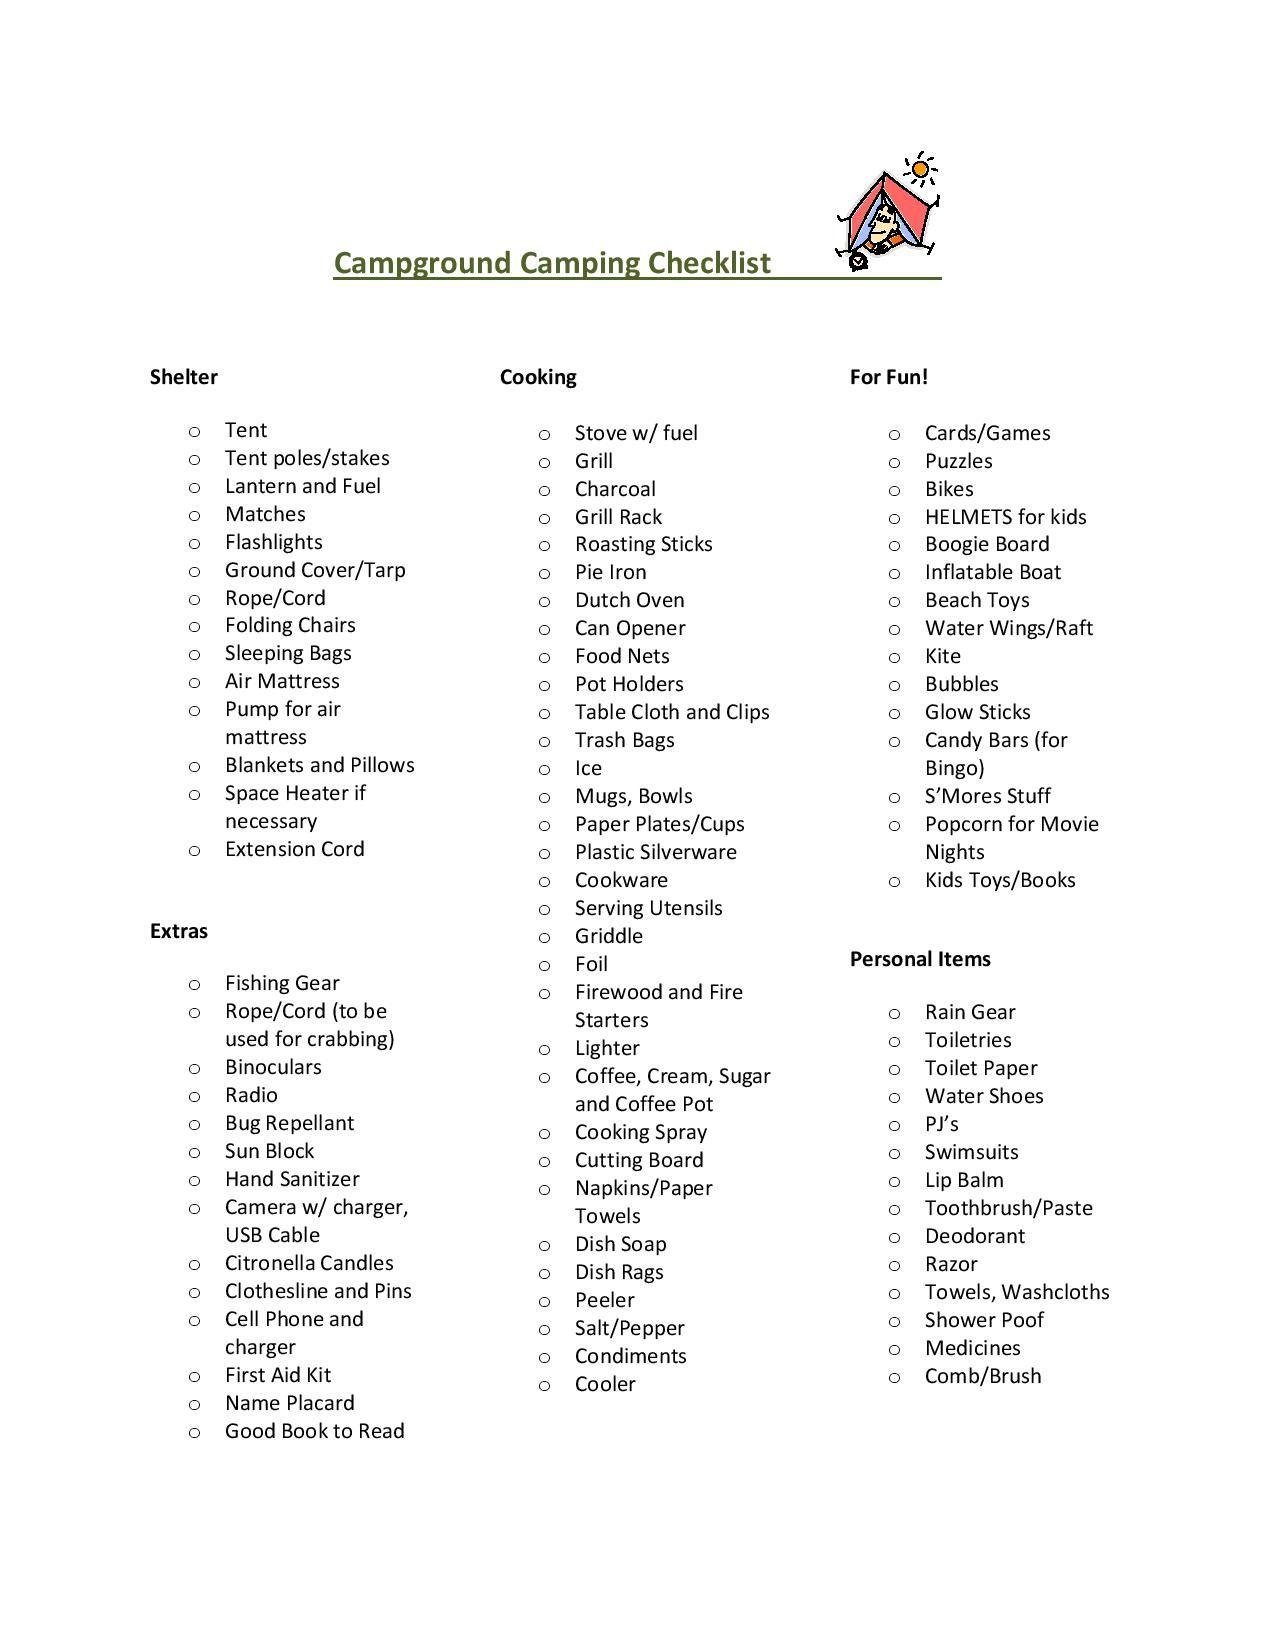 Campground Camping Checklist  Camping     Camping